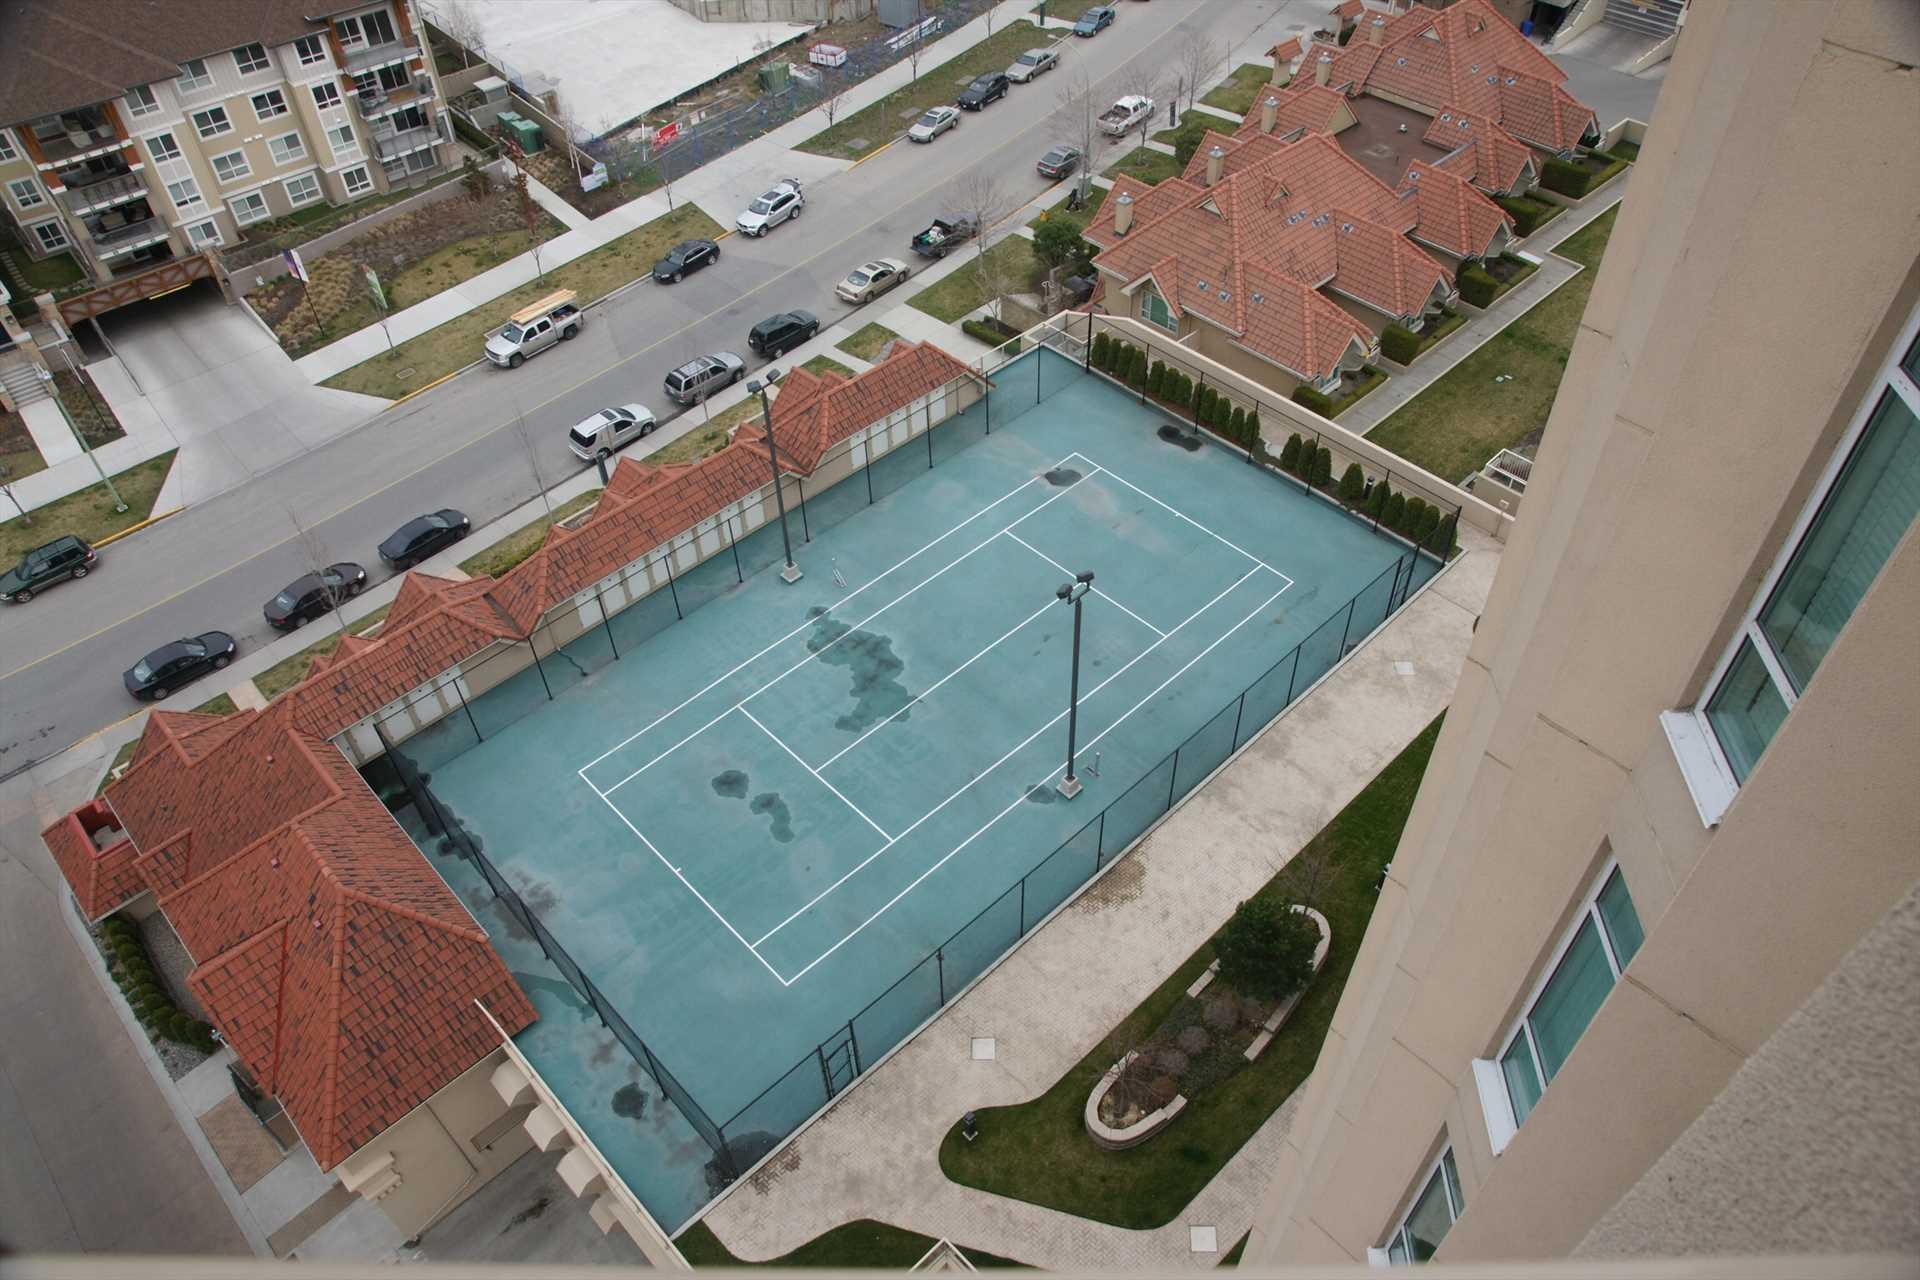 Tennis & Pickleball Court